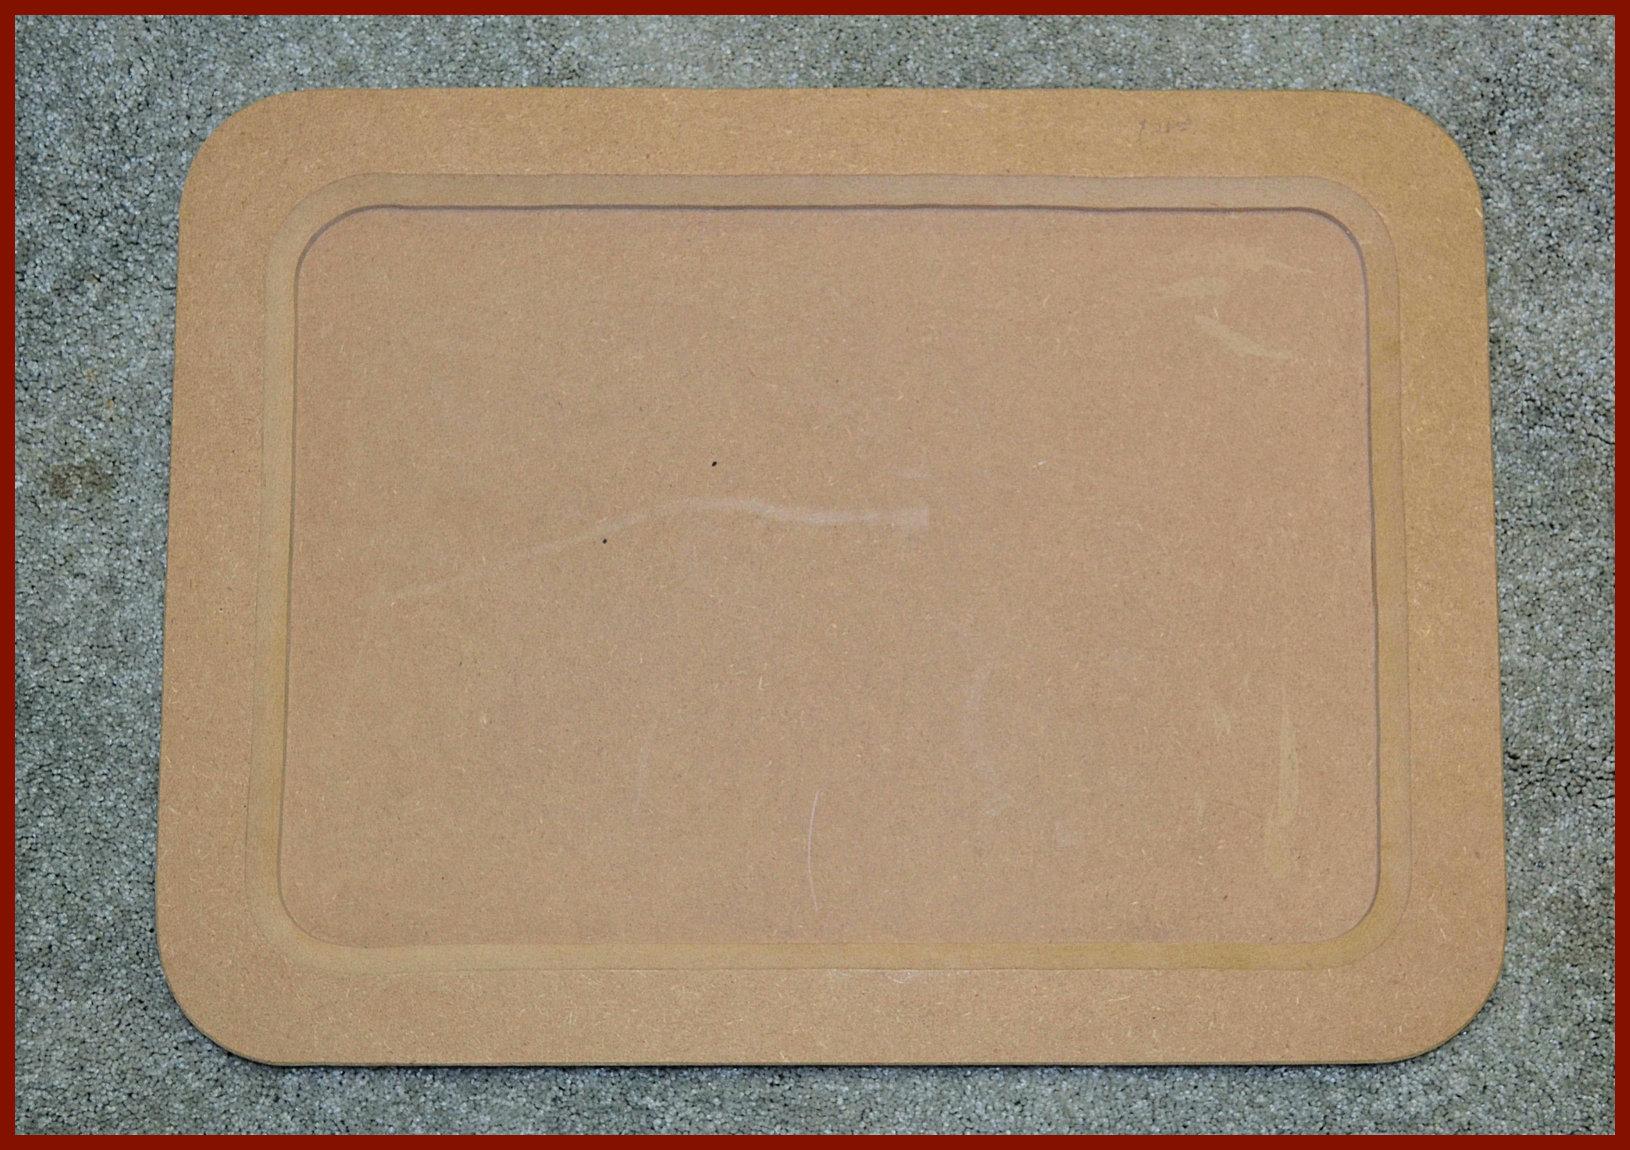 wood-tray-23-x-17-inches-19234004.jpg